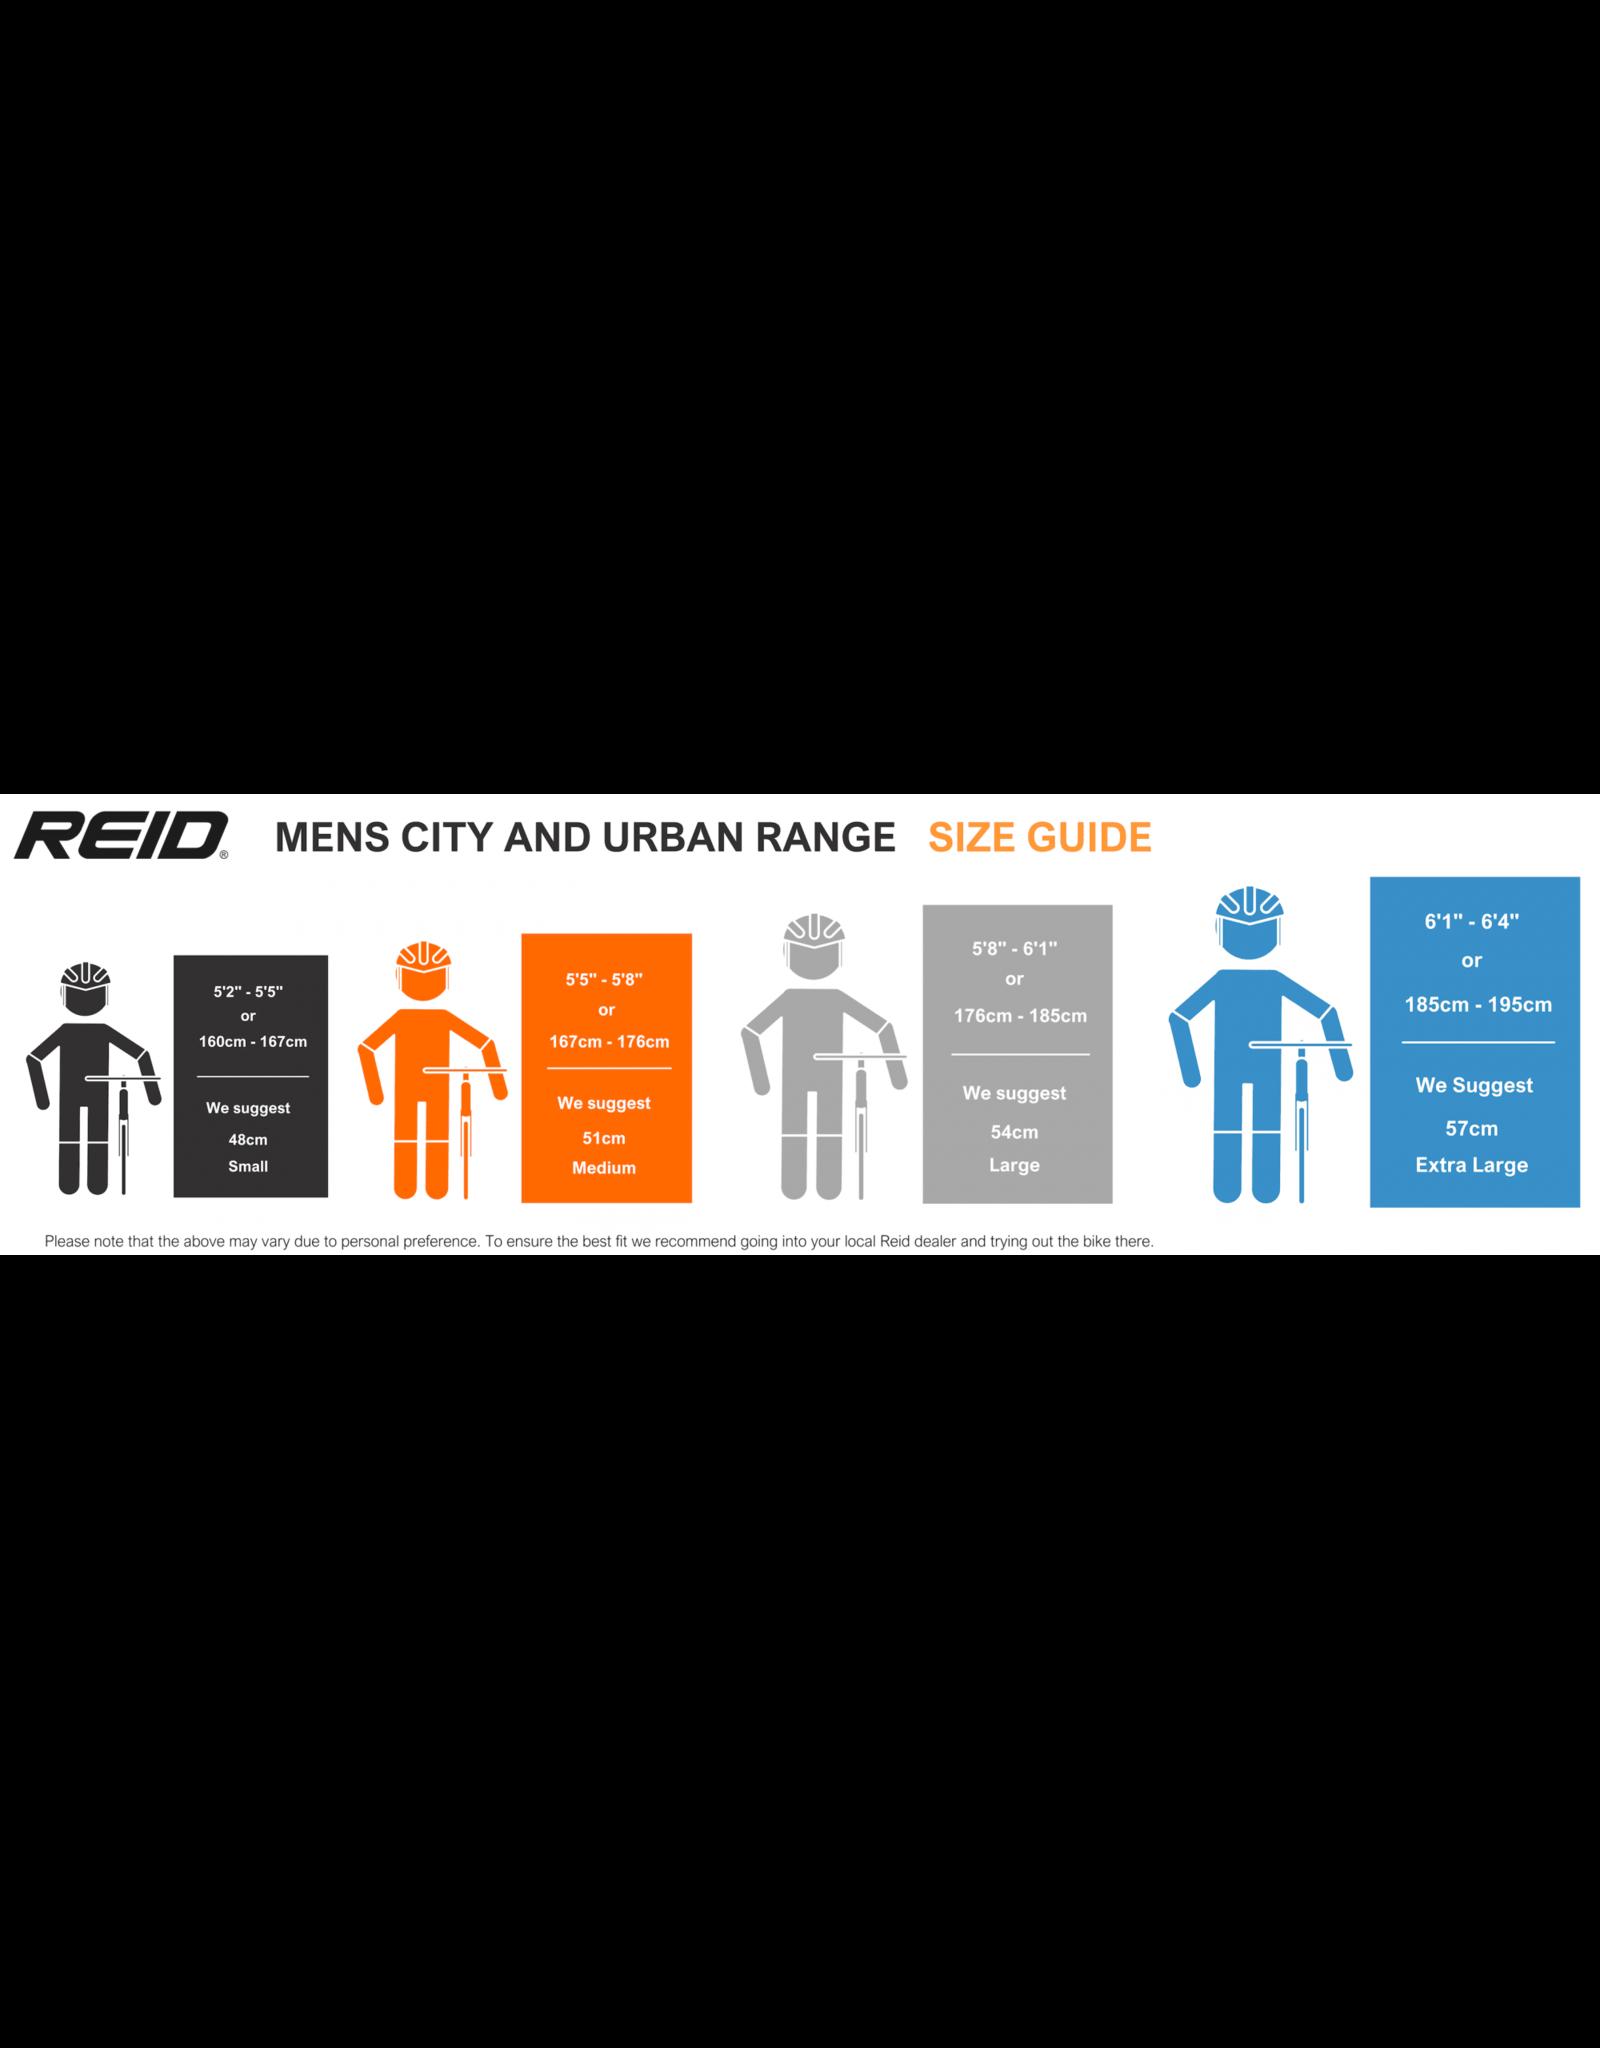 Reid City 1 Charcoal X-Large : 57cm